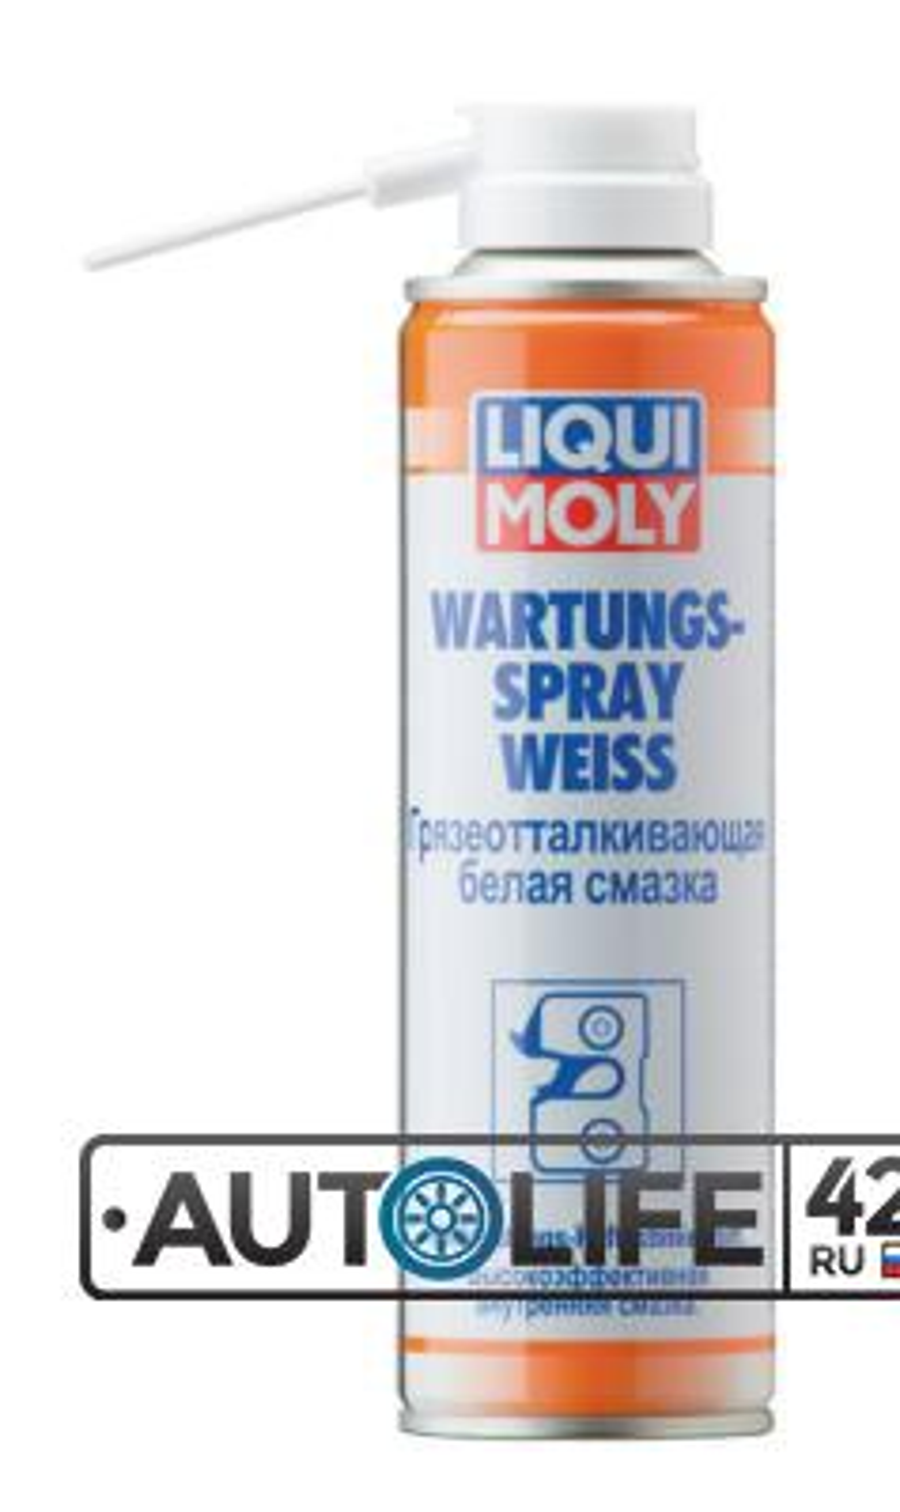 Грязеотталкивающая белая смазка Wartungs-Spray weiss (0,25л) LIQUI MOLY 3953  (12шткор) LIQUI MOLY 3953